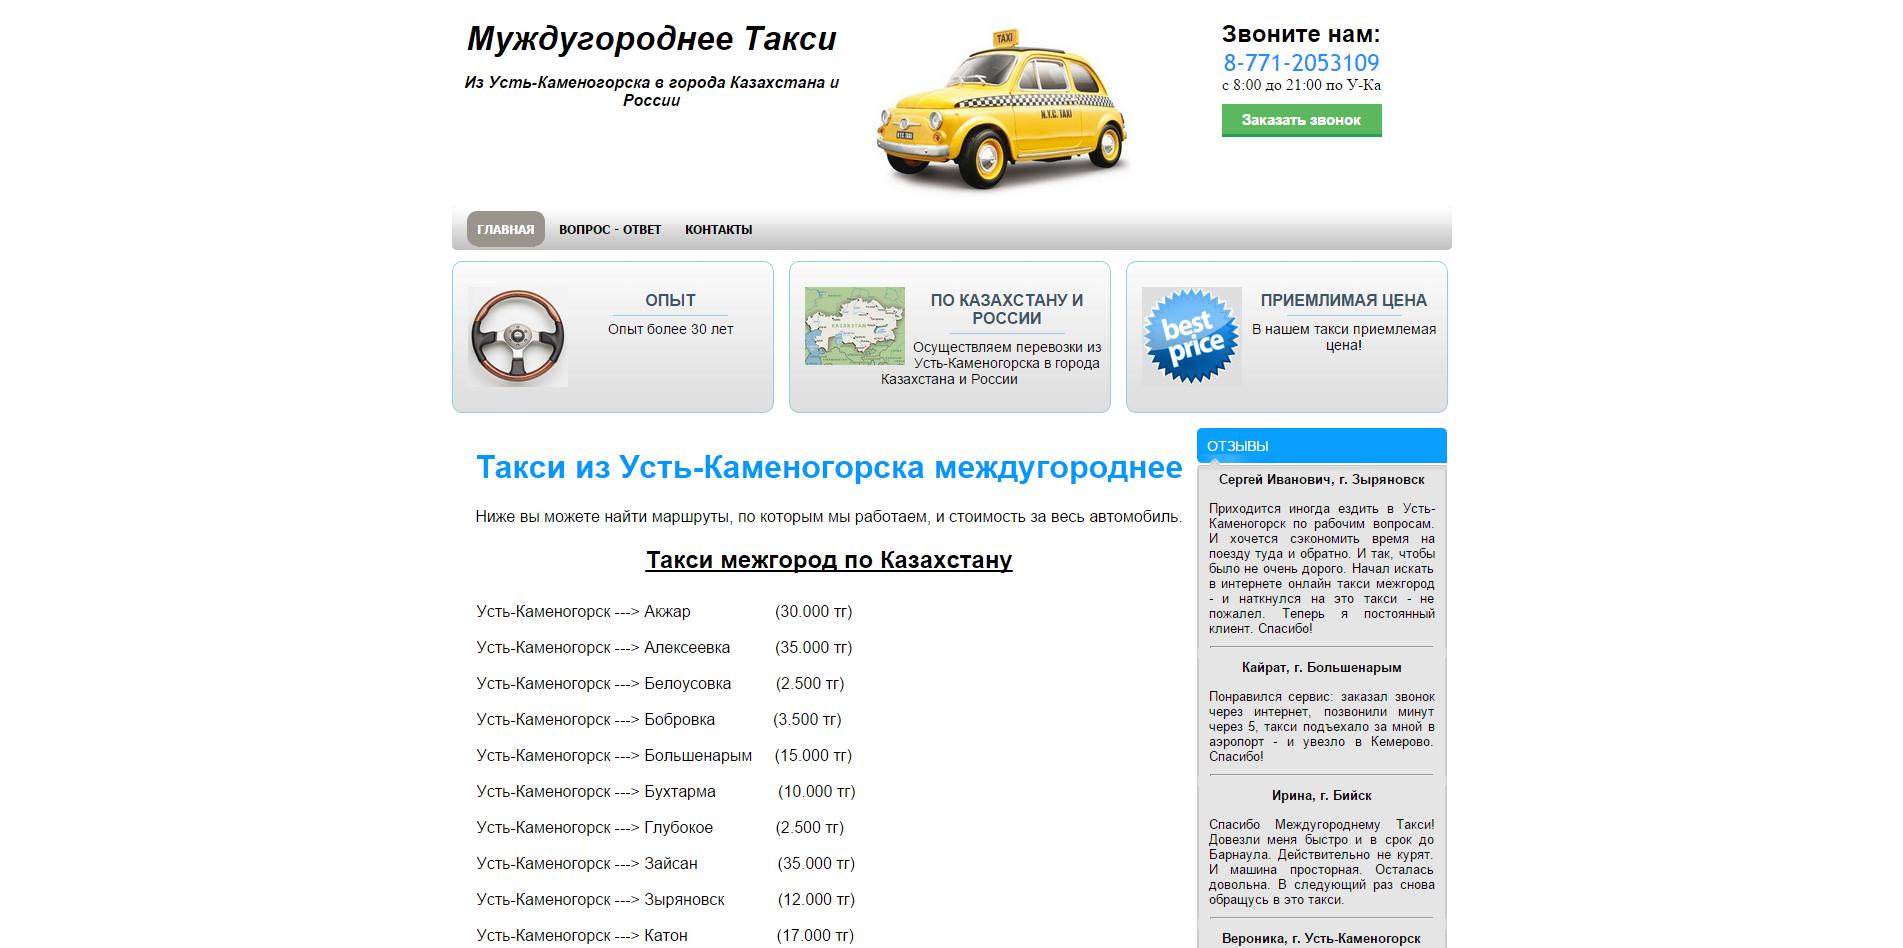 Такси ВКО